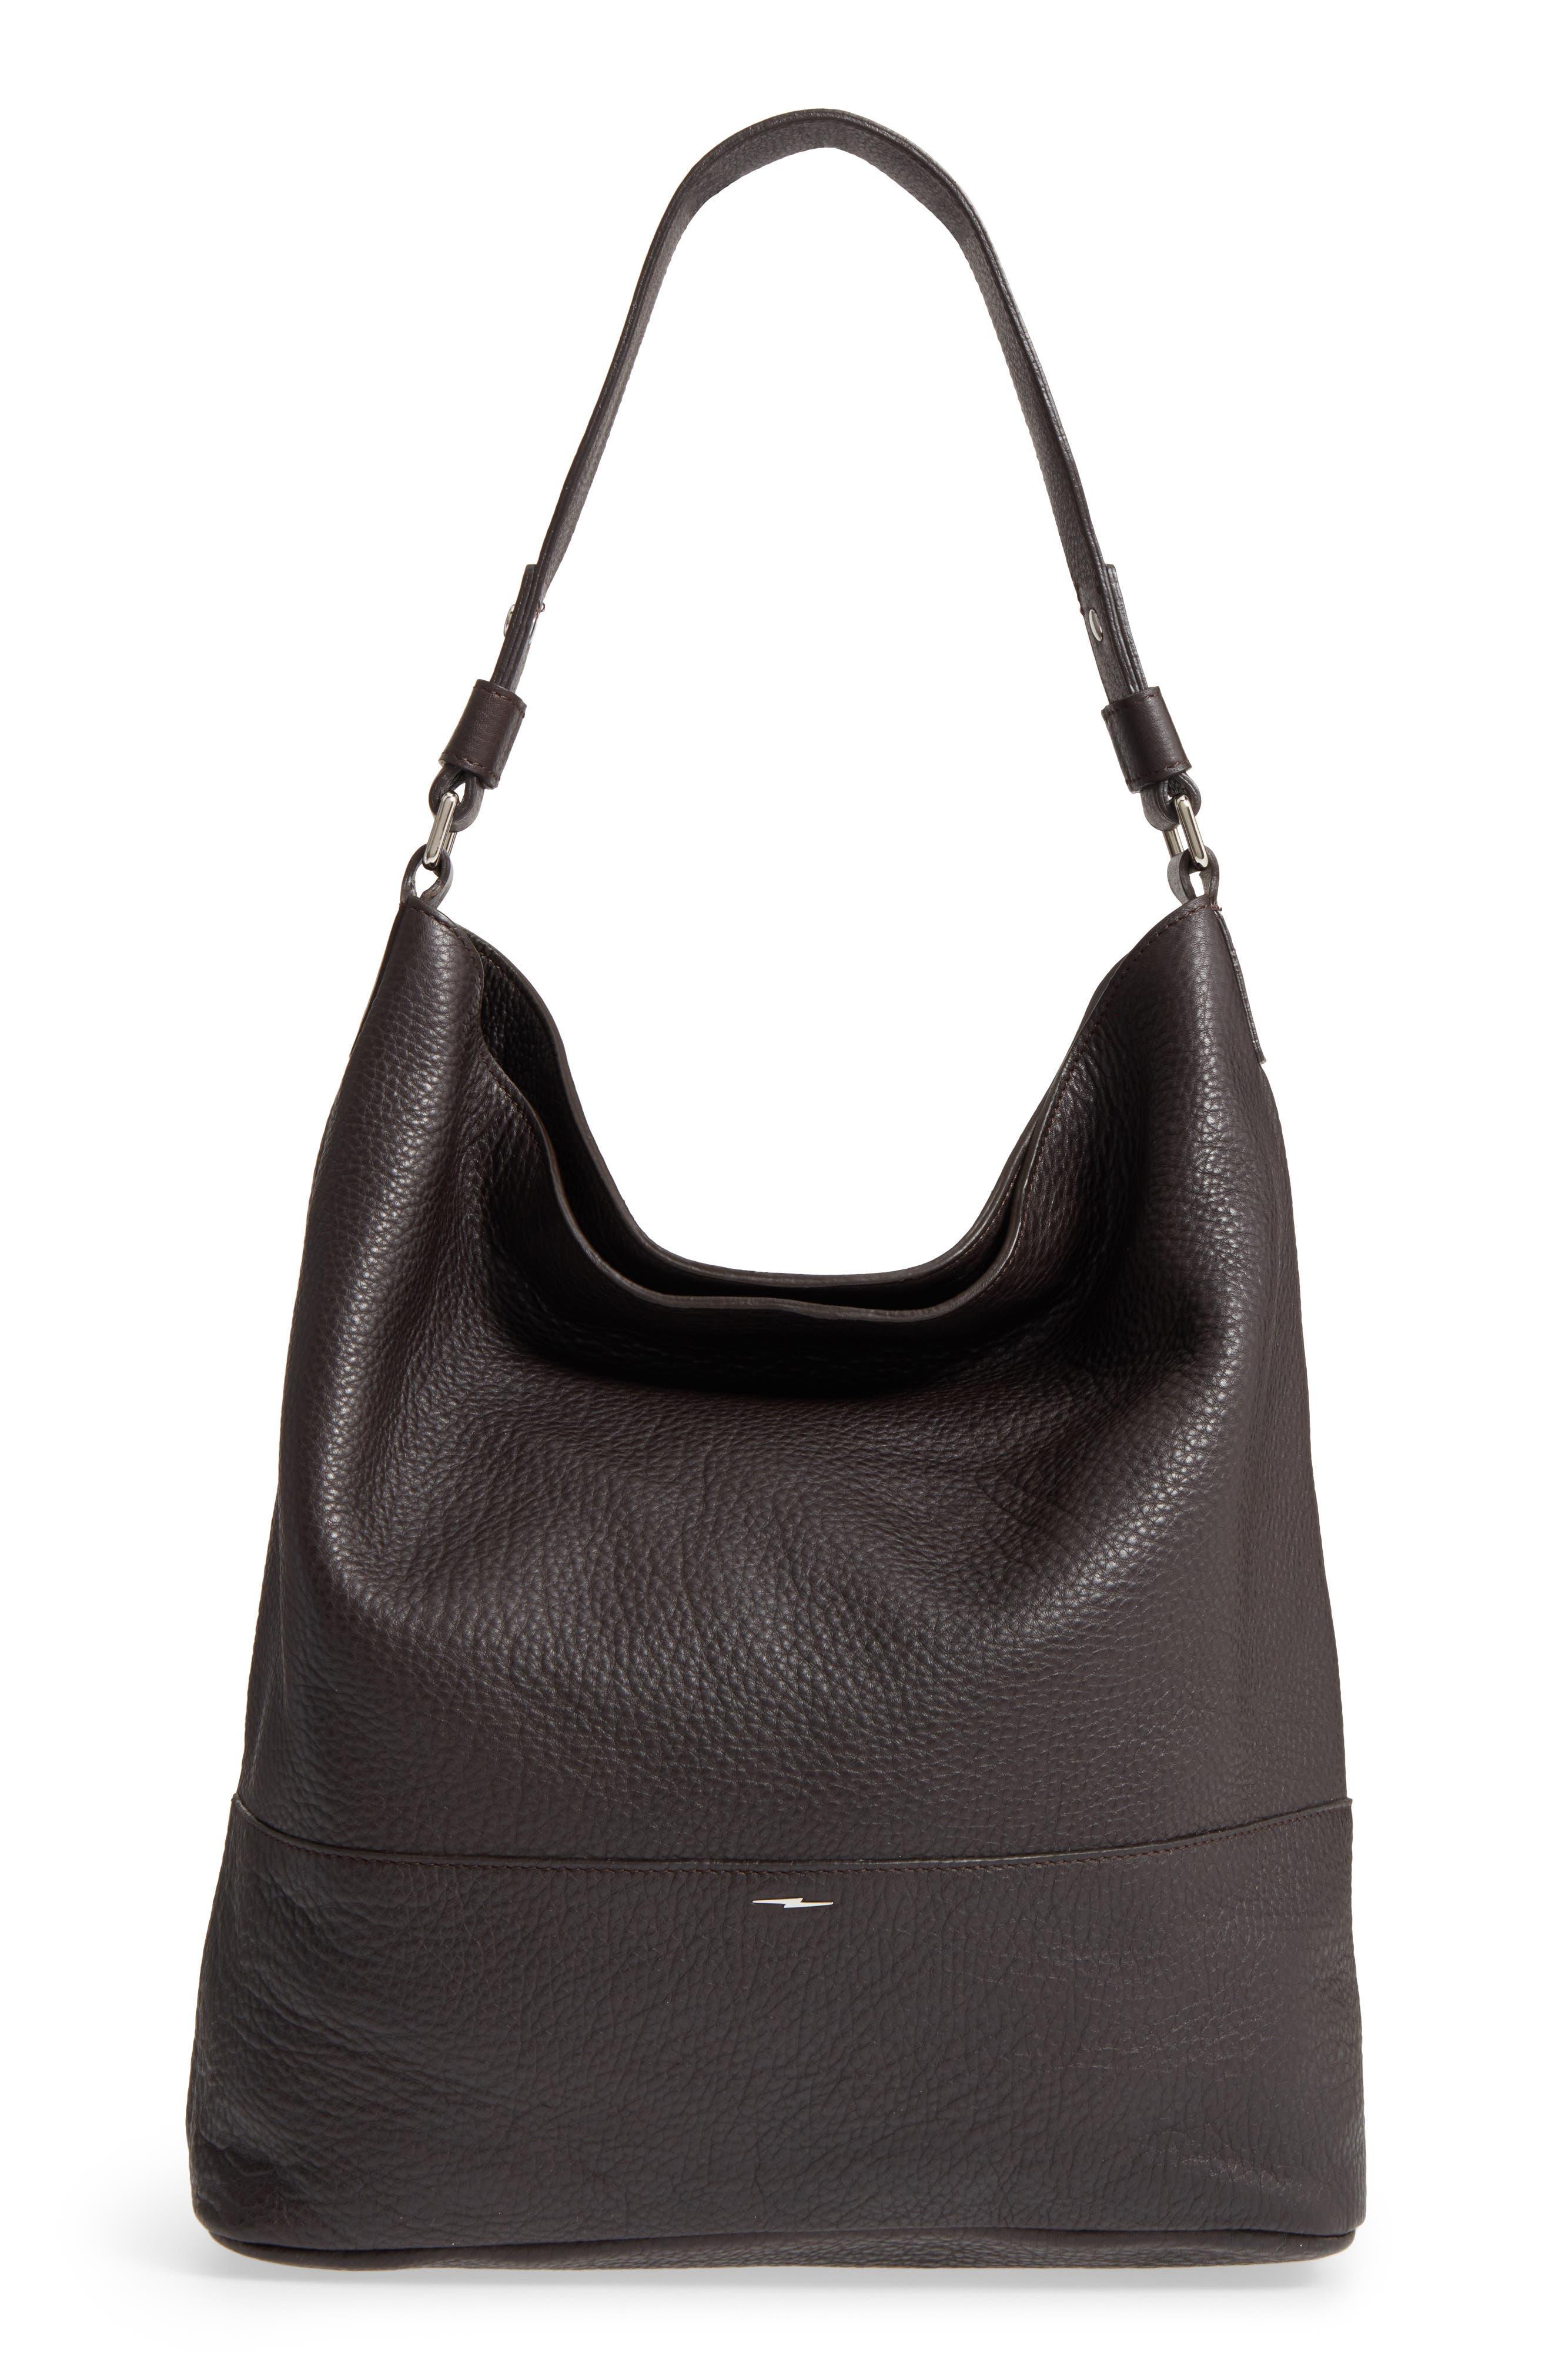 Main Image - Shinola Relaxed Calfskin Leather Hobo Bag